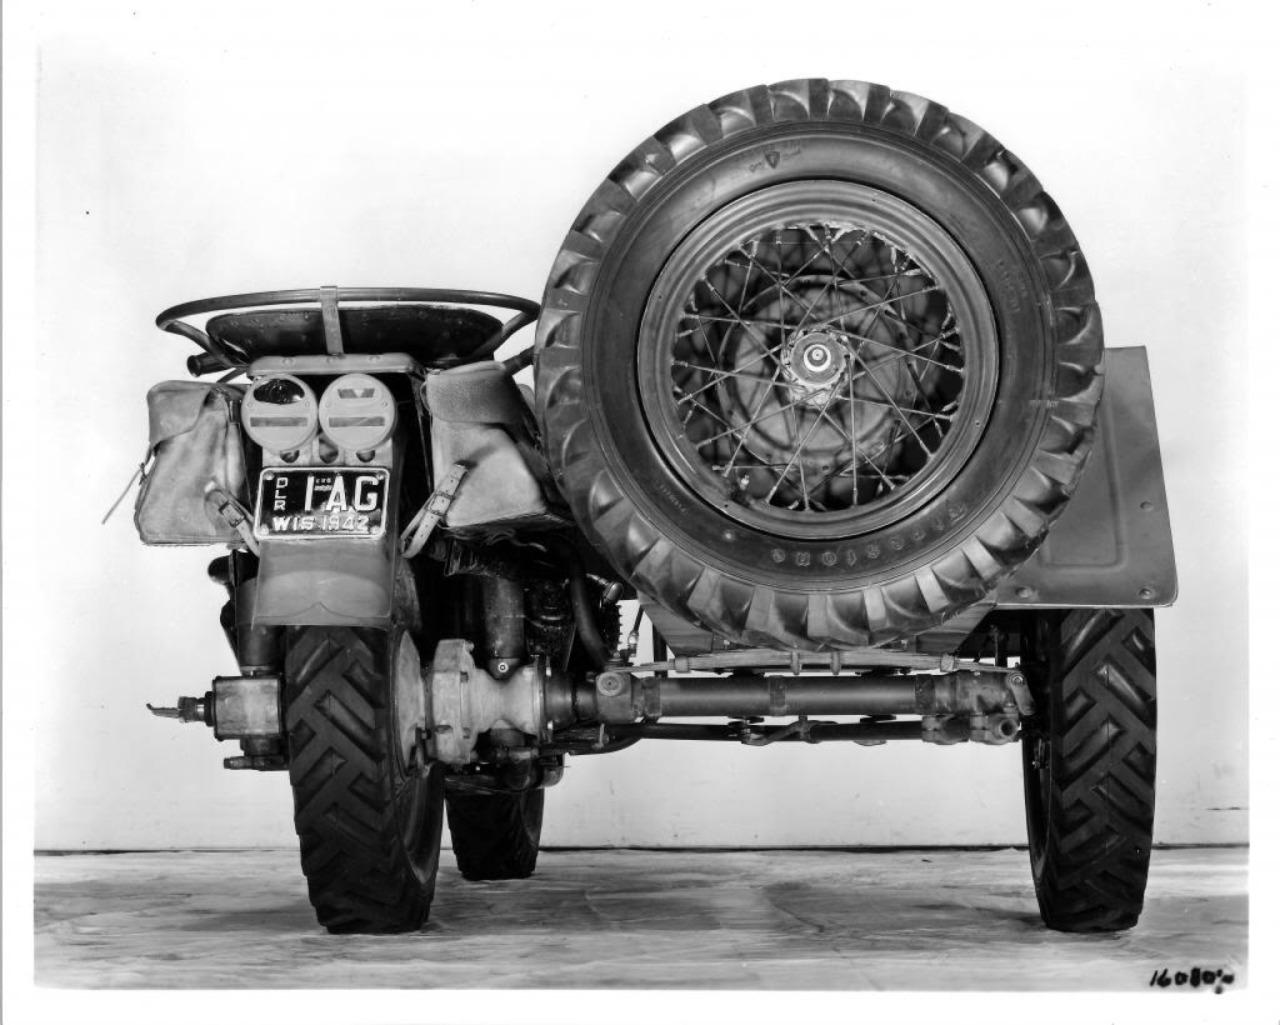 Modelo XA - Sidecar - Vista trasera